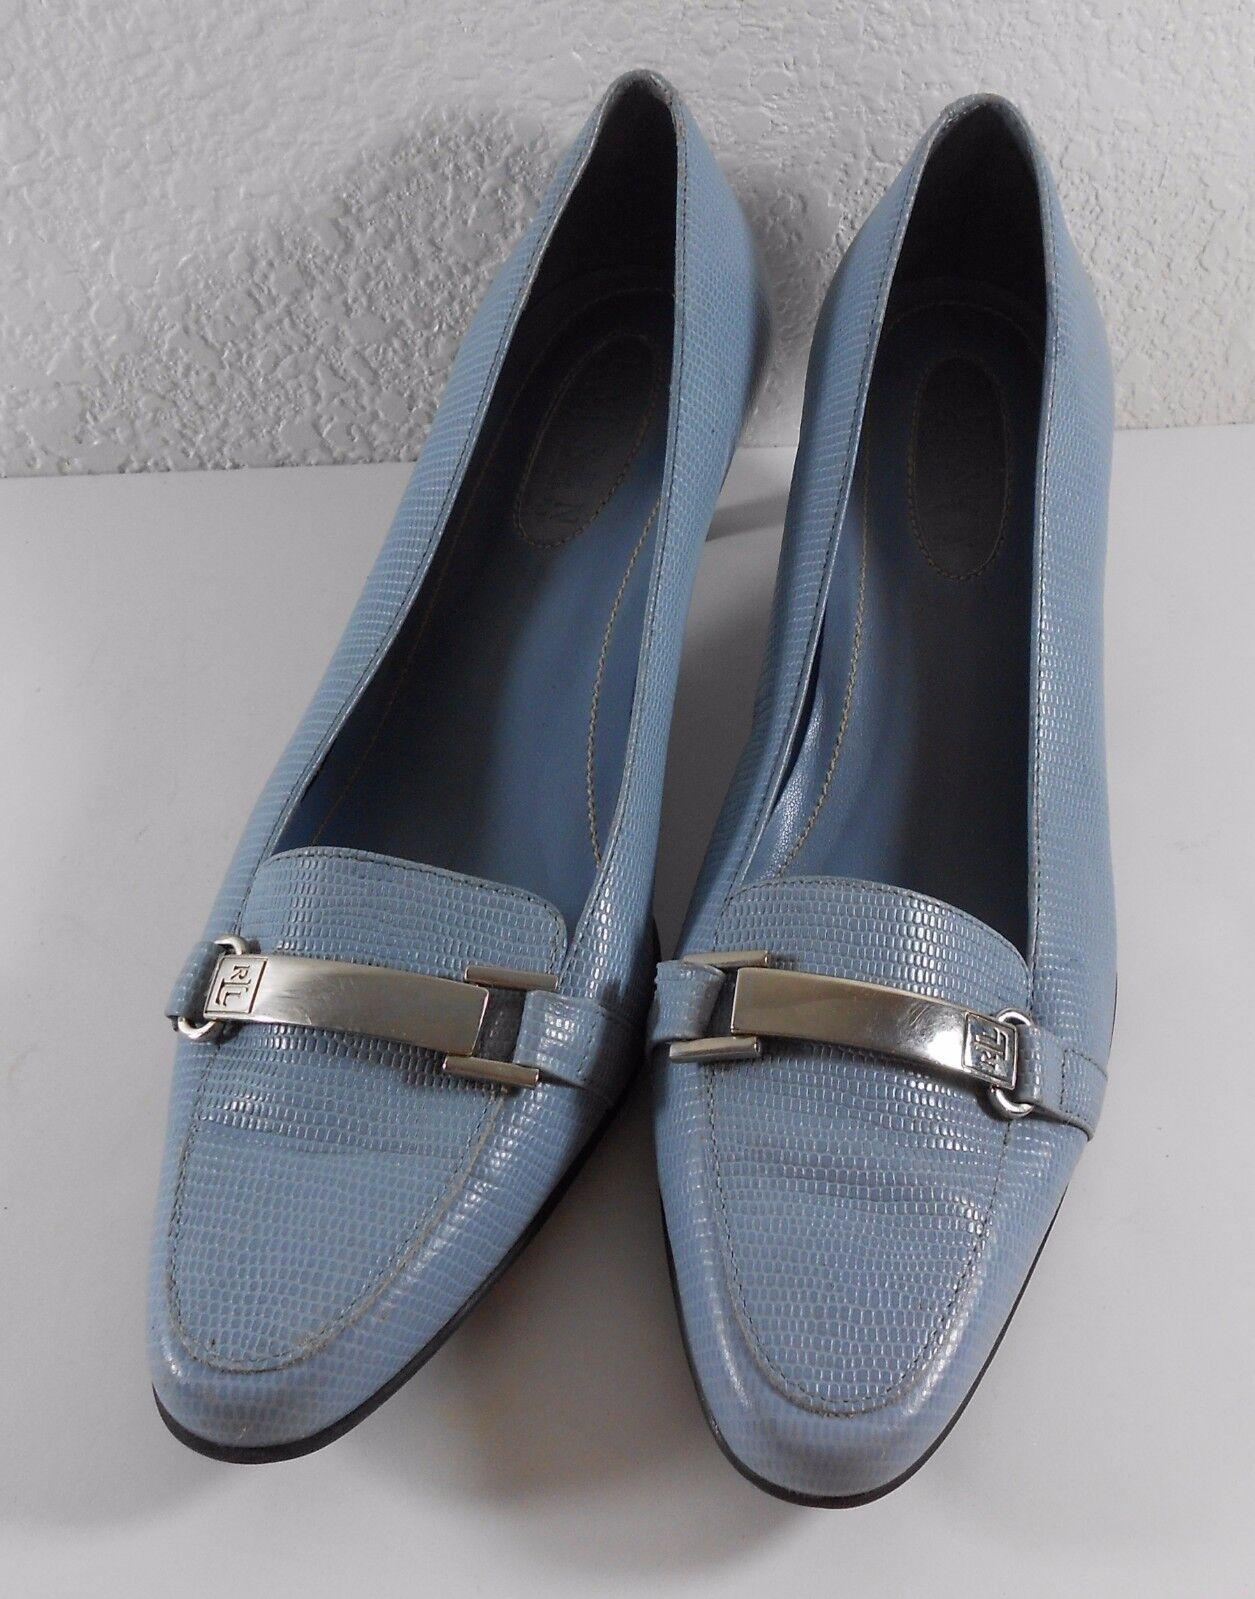 Lauren Ralph Lauren Megan 7 1/2 B Heels Light Blue Leather Kitten Heels B Shoes Brazil fc1243